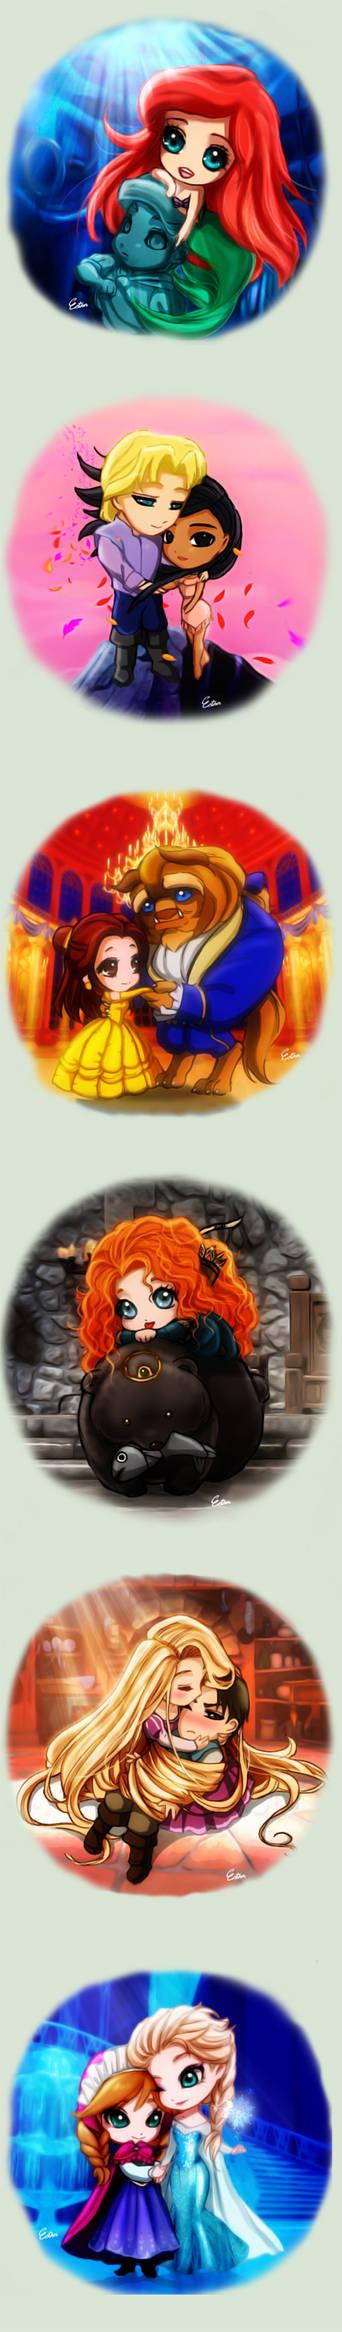 Disney Chibi by Esther-Shen